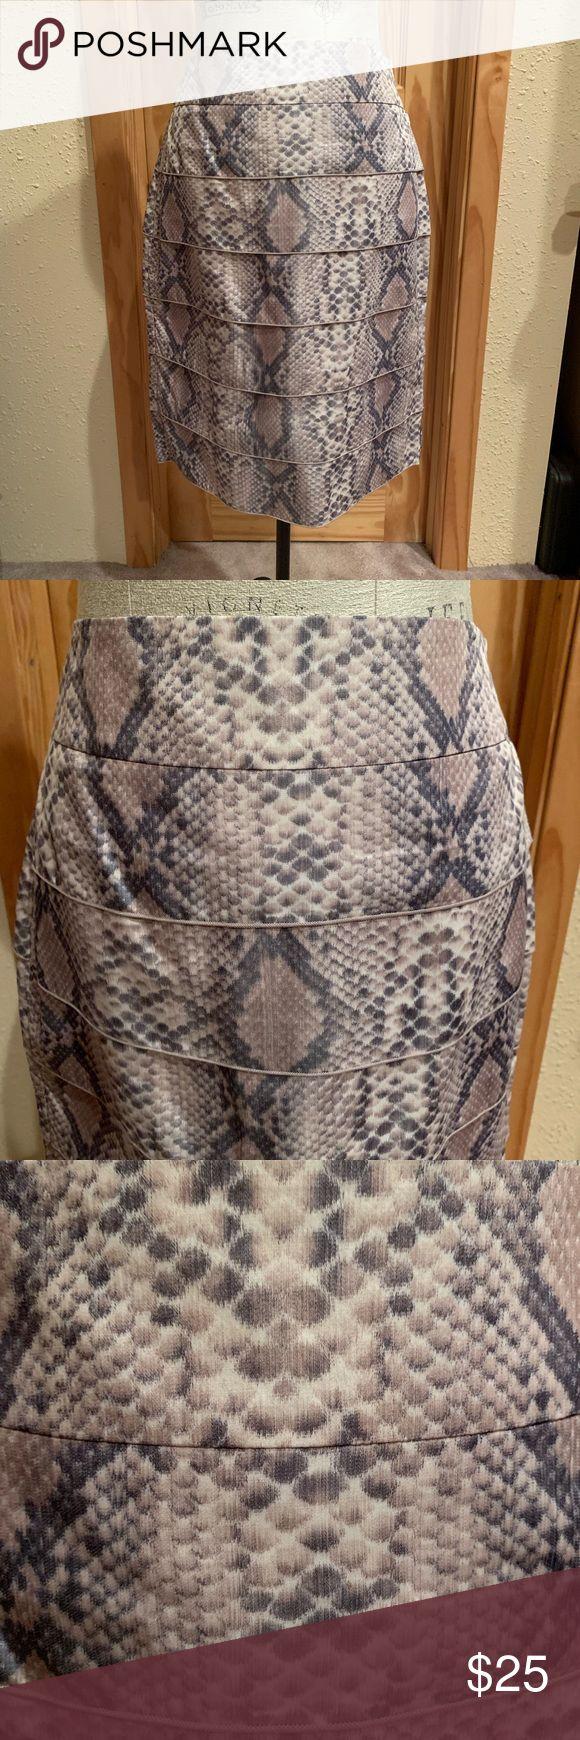 Tribal Skirt Size 6 Beautiful skirt in snakeskin pattern. Like new condition. Ha…